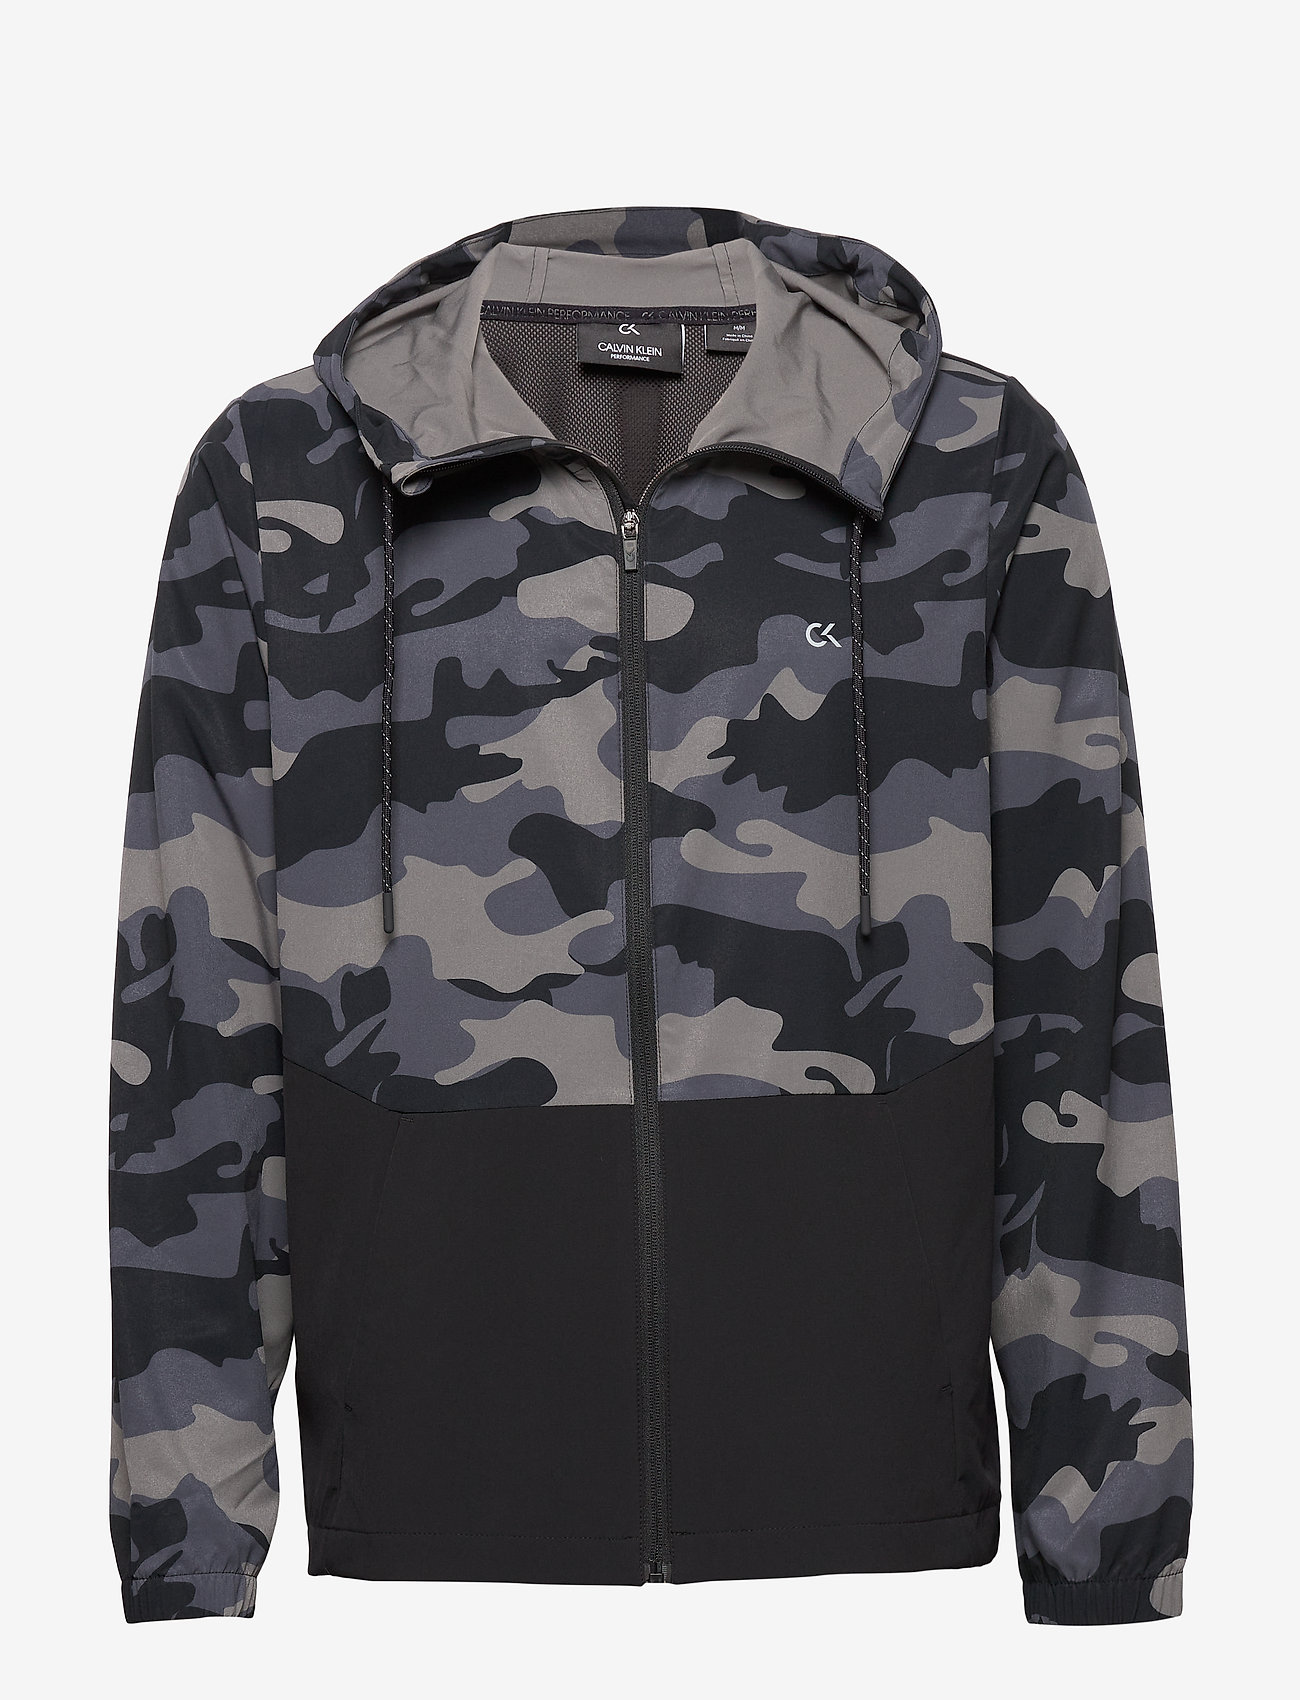 Calvin Klein Performance Windjacket - Jackets & Coats